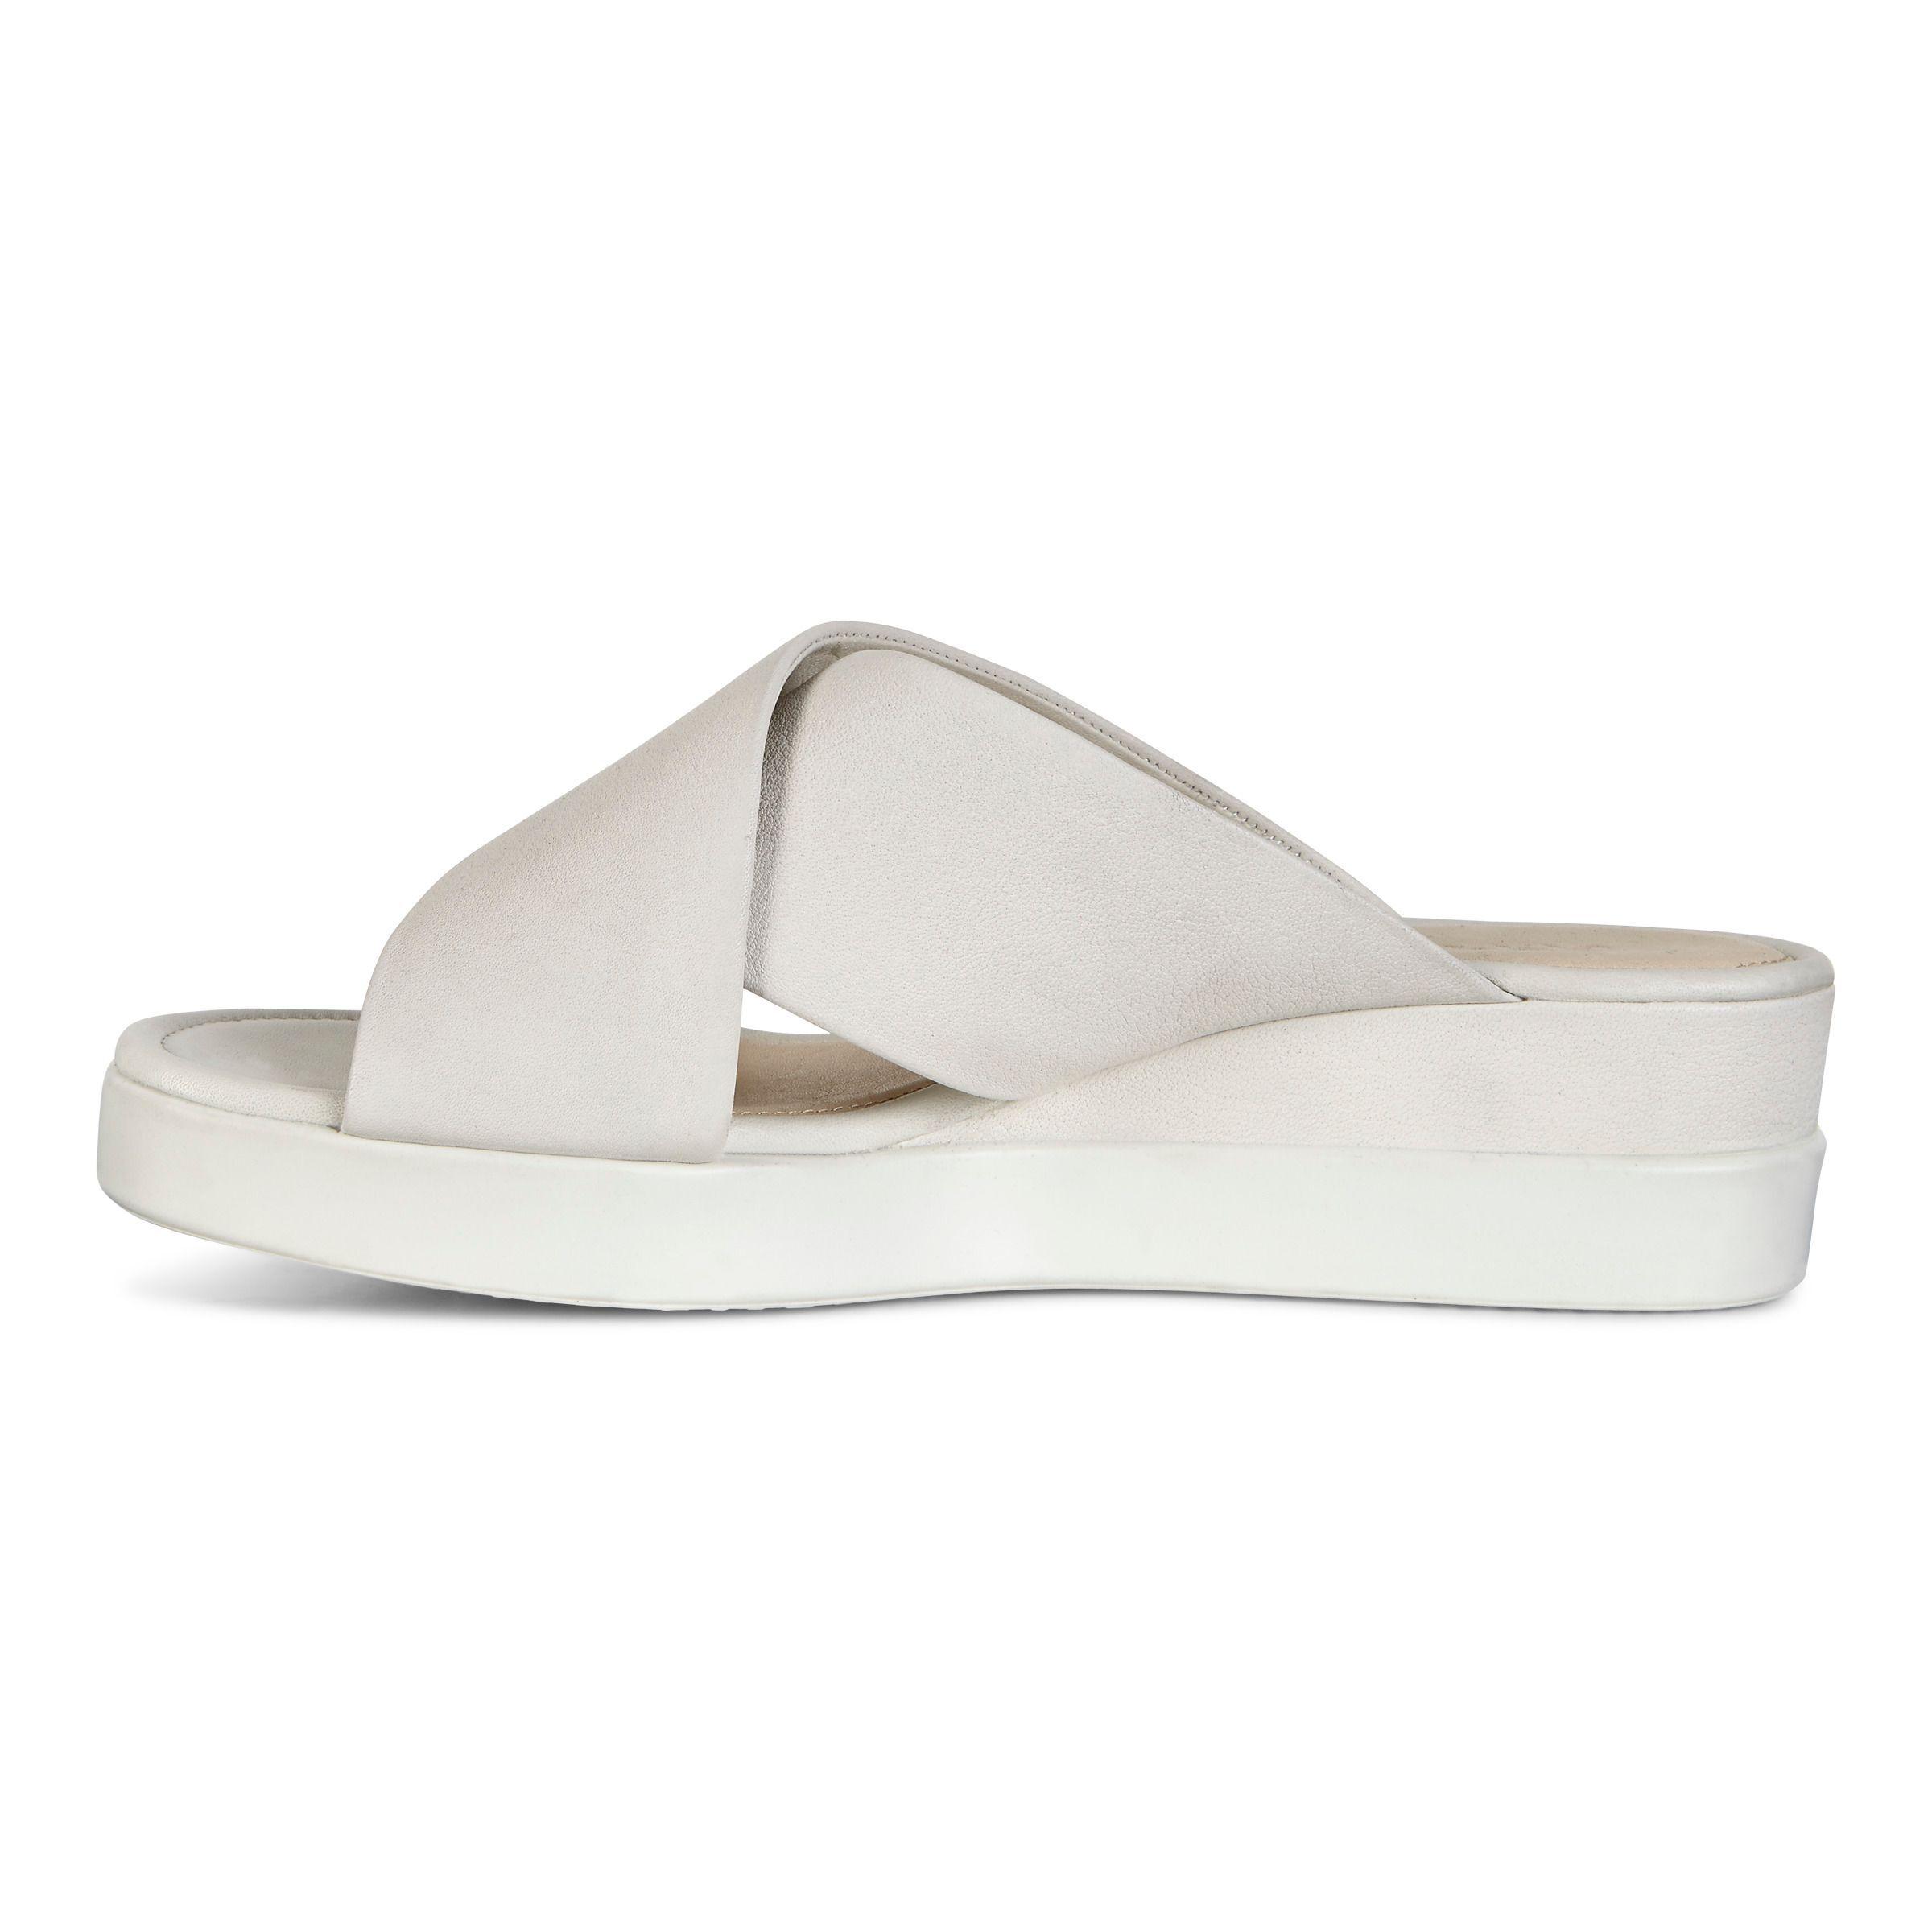 ... ECCO Touch Slide SandalECCO Touch Slide Sandal in WHITE (01007) ...